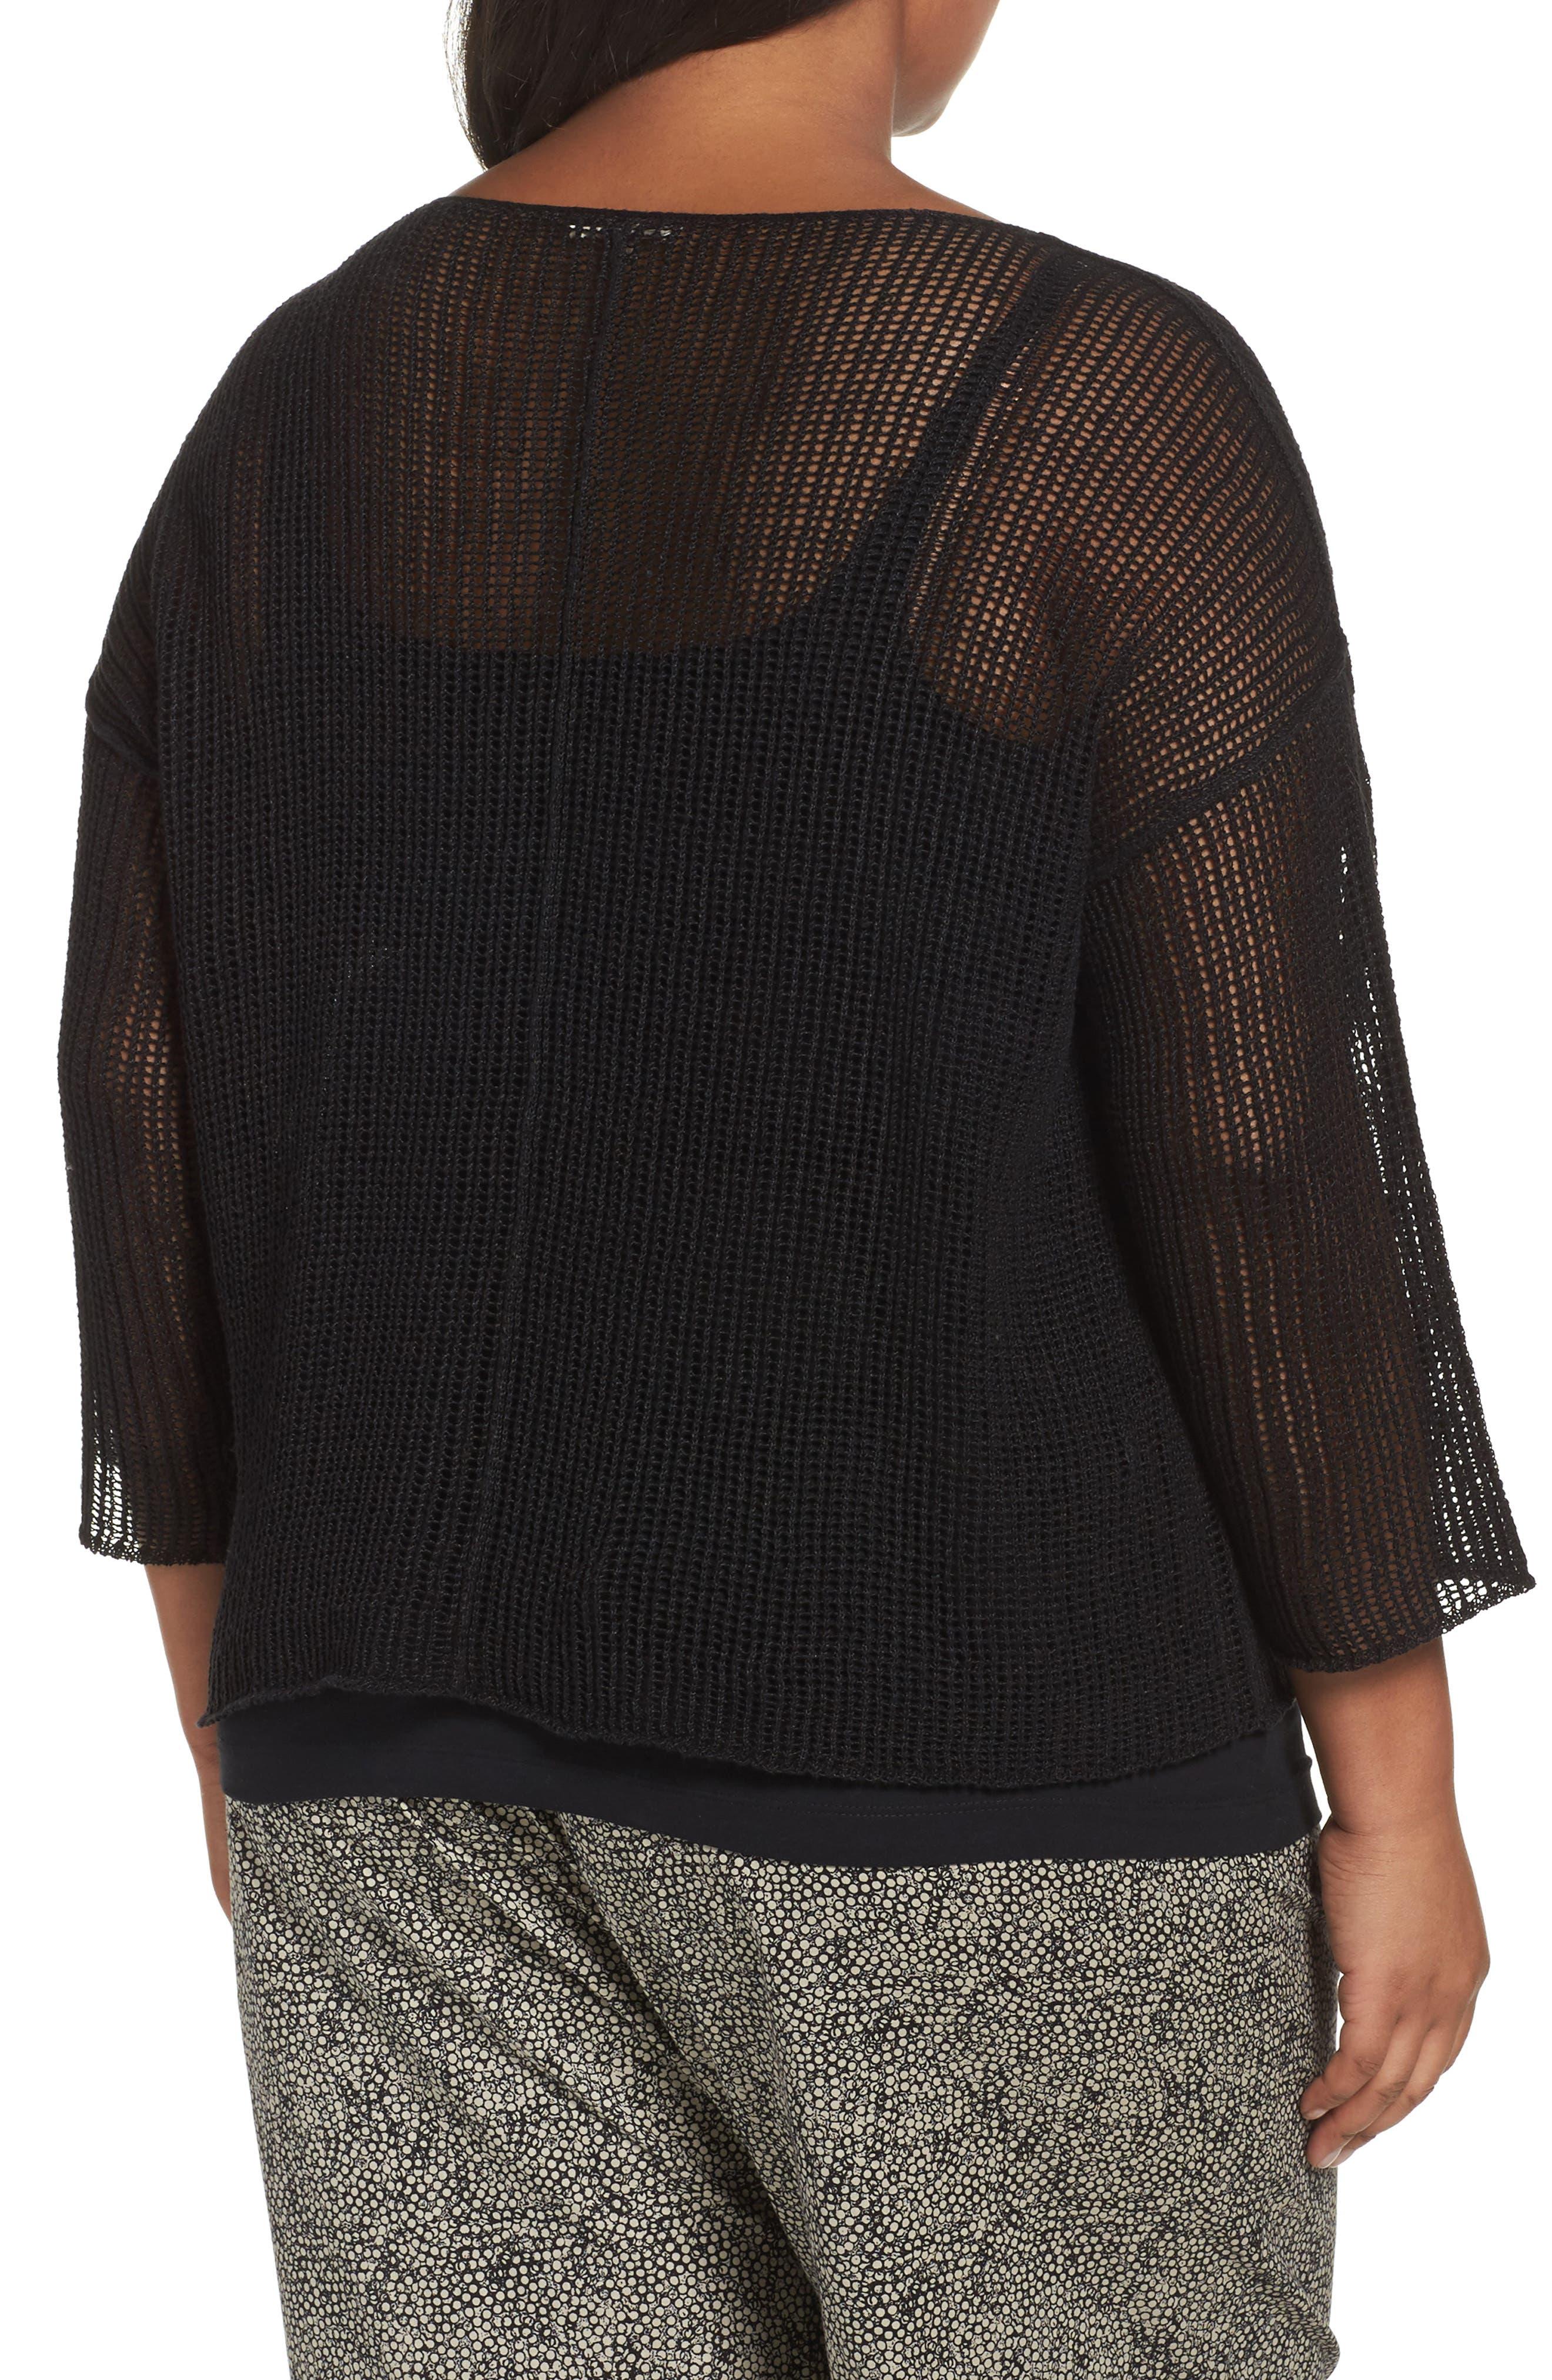 Organic Linen Mesh Knit Top,                             Alternate thumbnail 2, color,                             Black